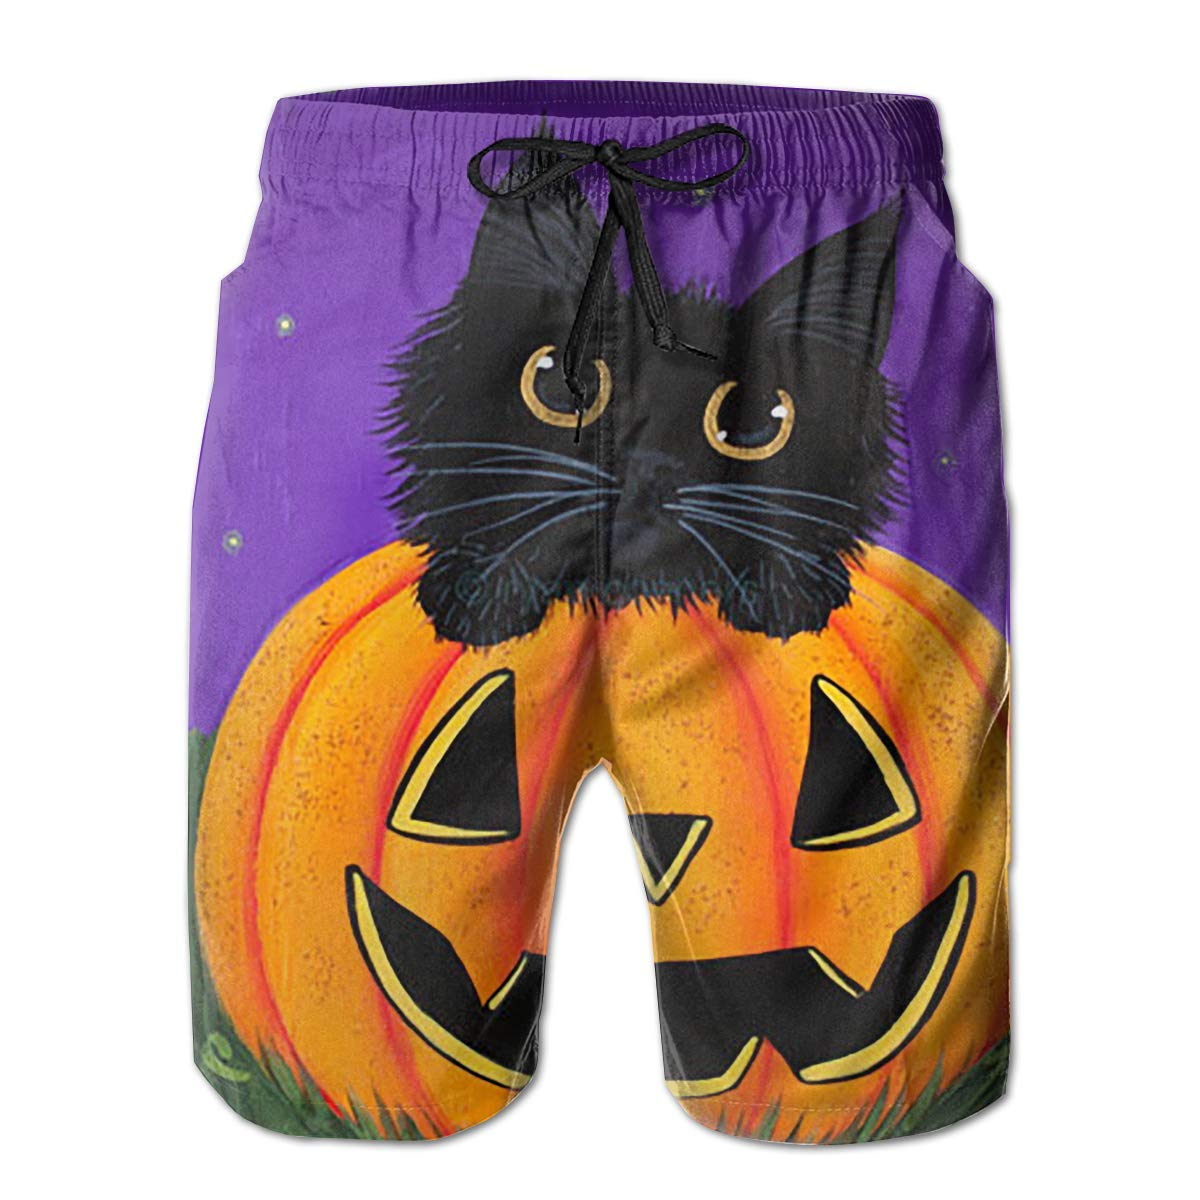 Mens Halloween Cat Drive A Pumpkin Shorts Pockets Swim Trunks Beach Shorts,Boardshort